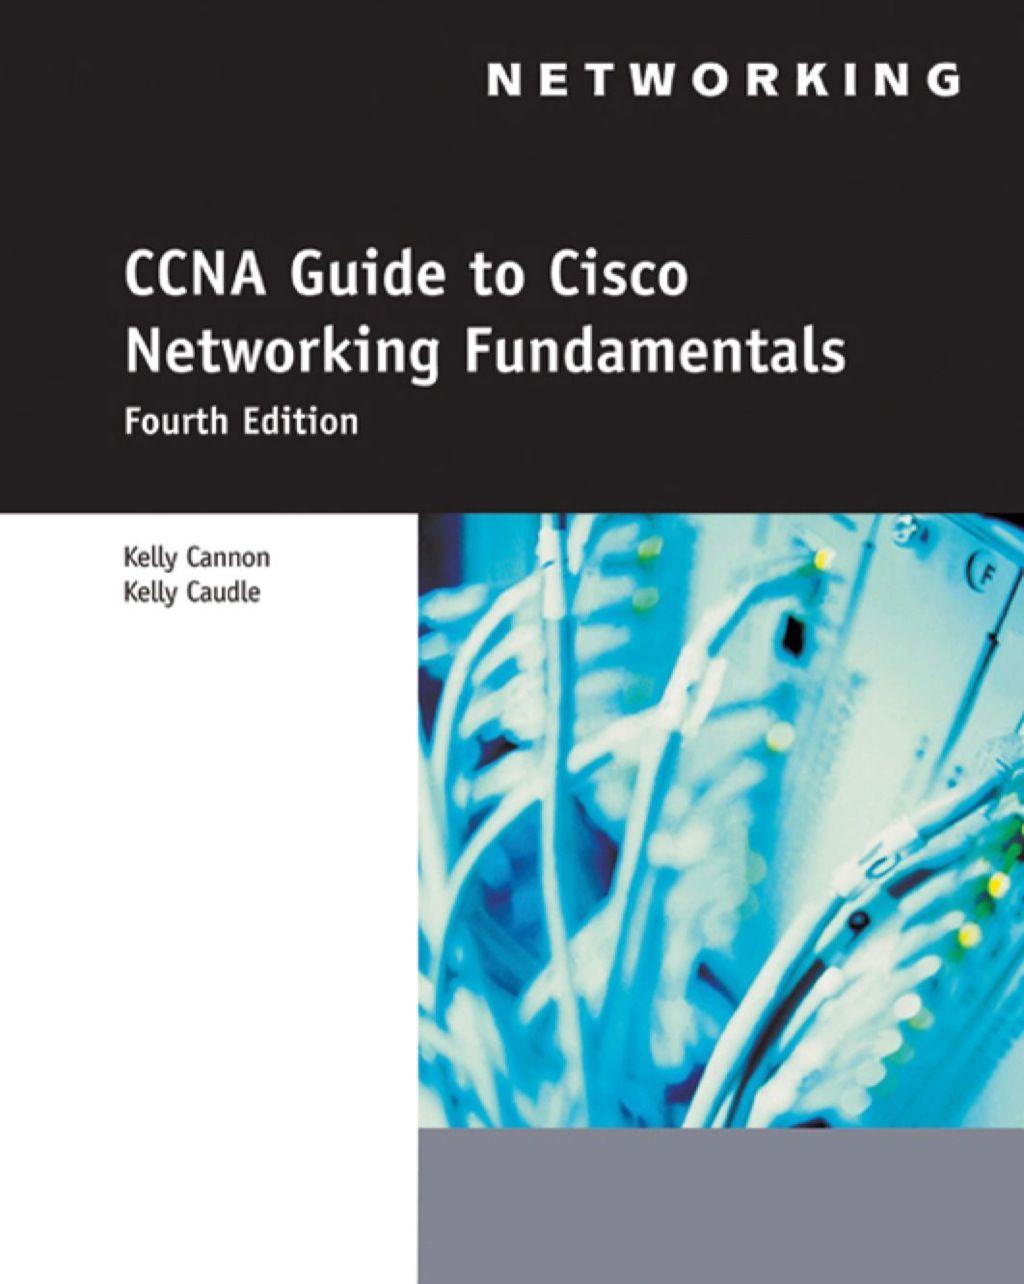 CCNA Guide to Cisco Networking Fundamentals (eBook Rental